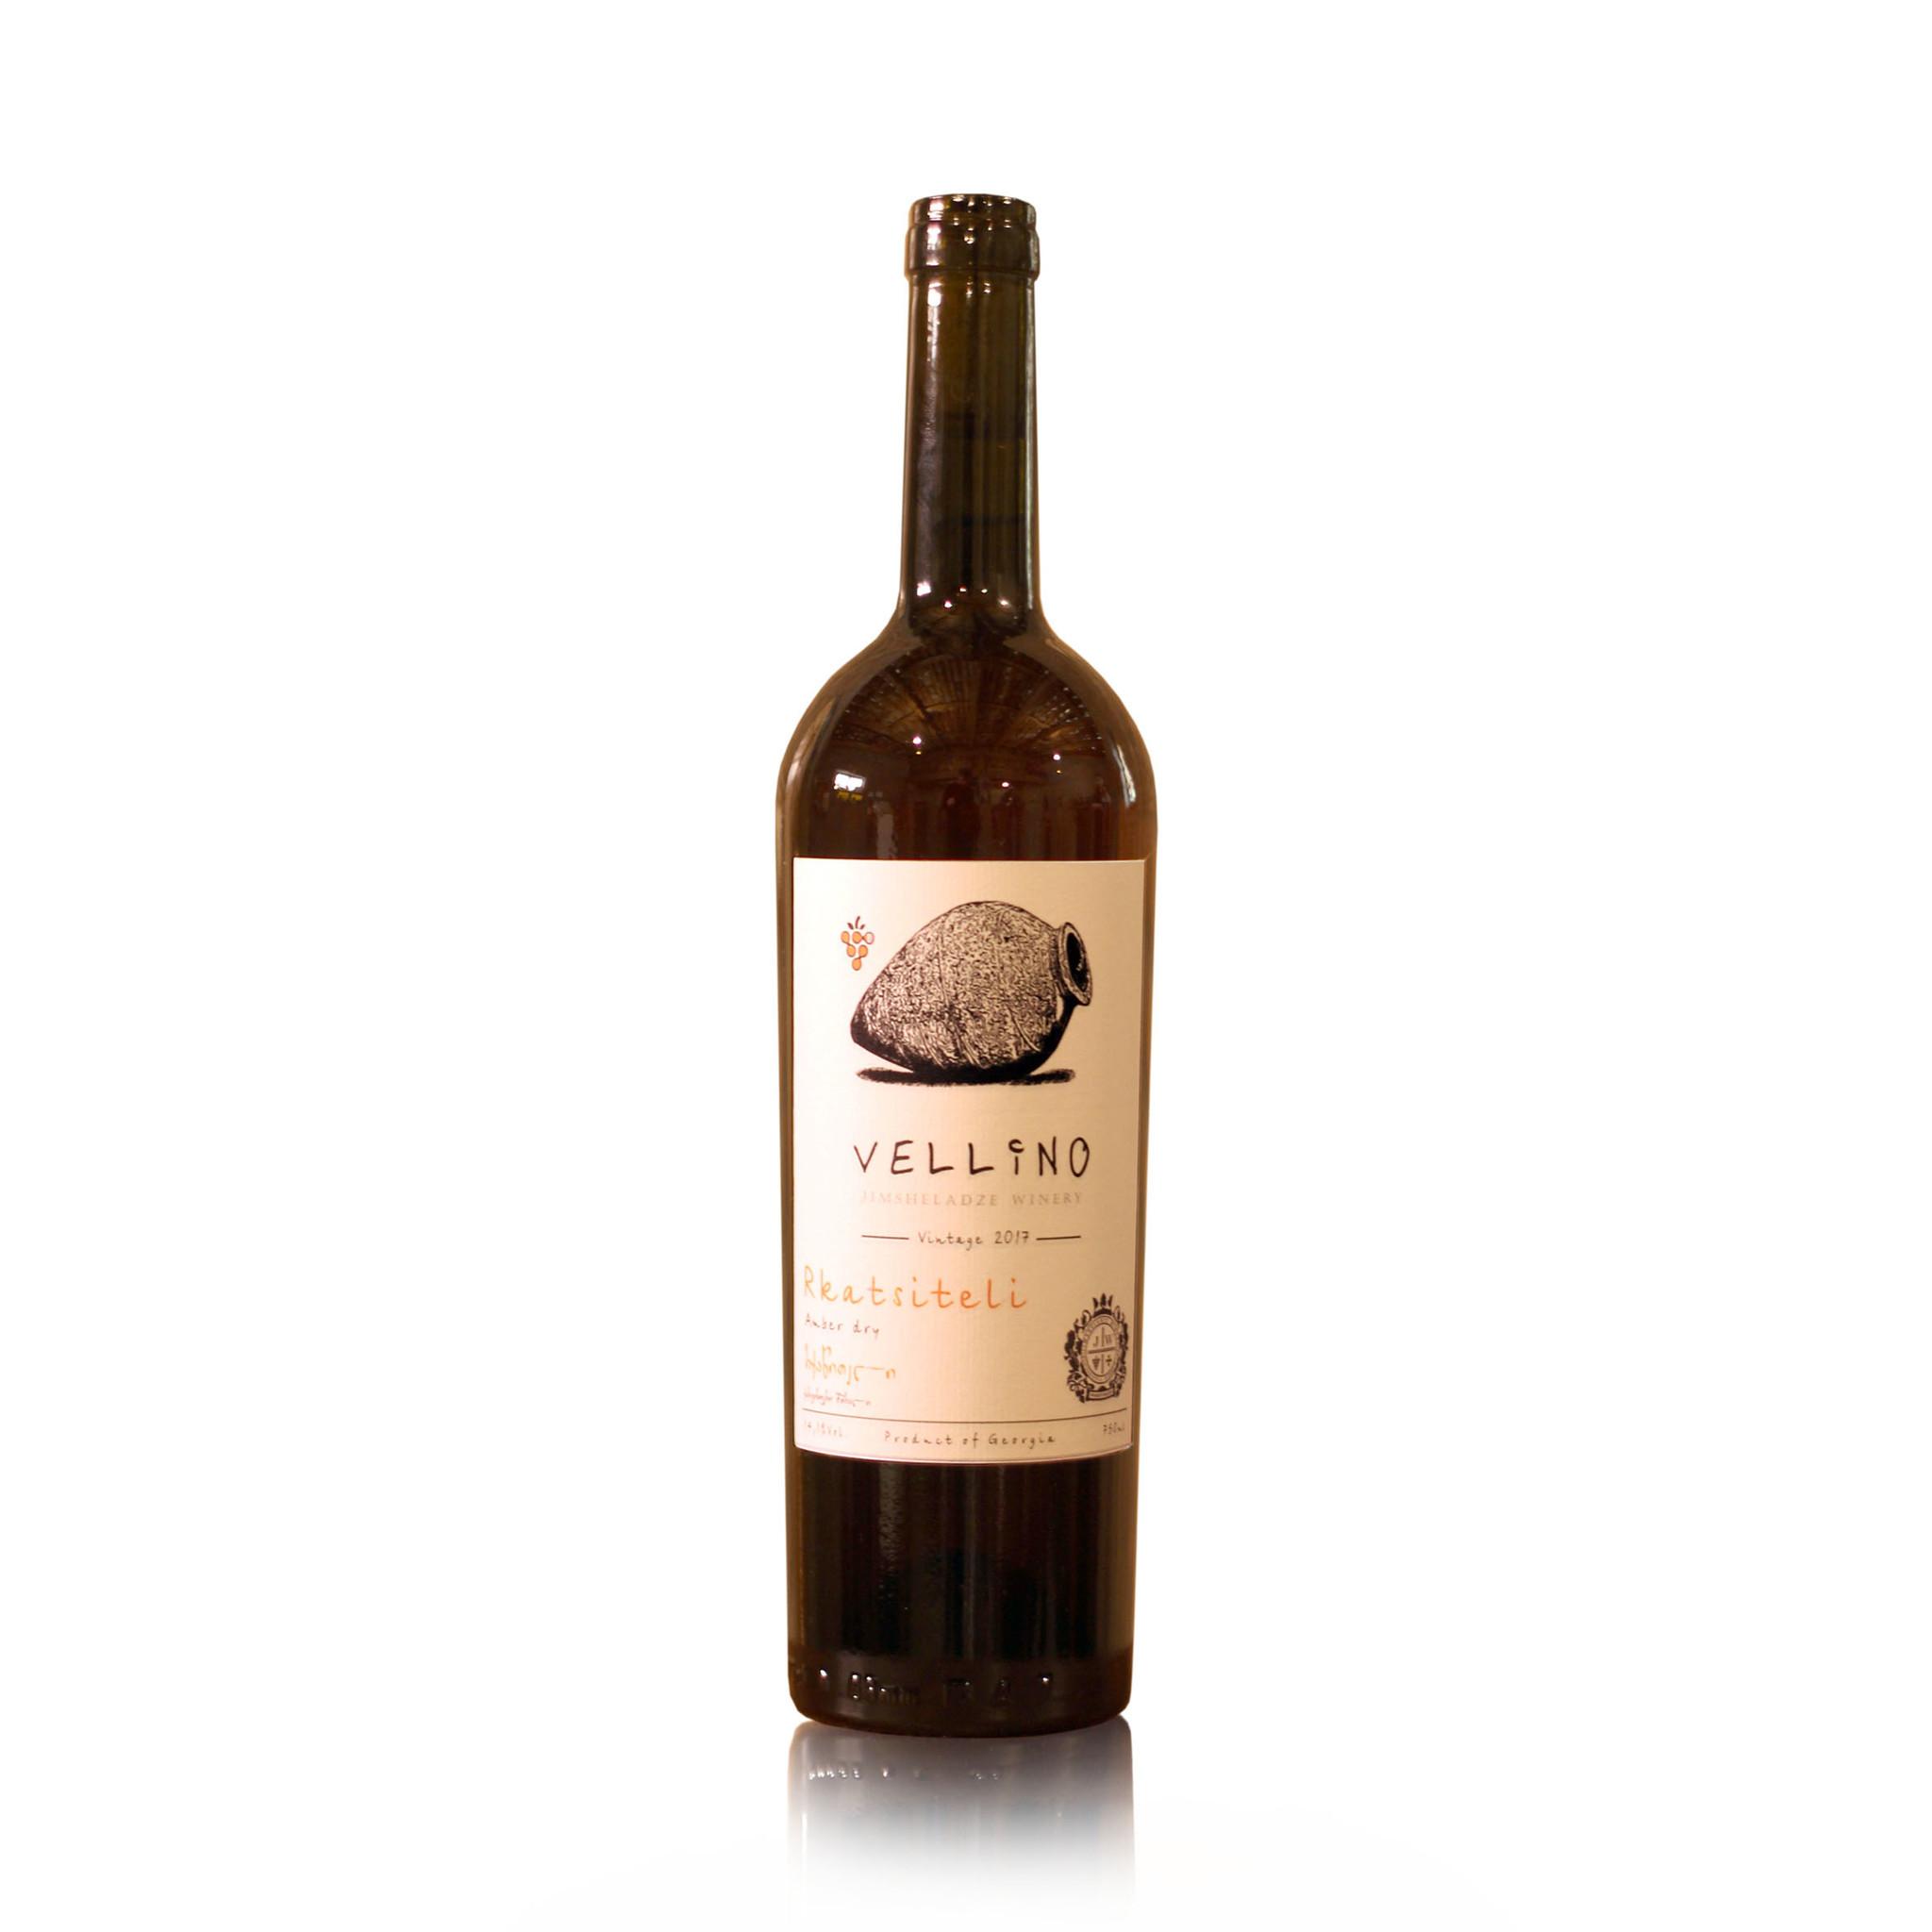 Merk Vellino Rkatsiteli Vellino, Amber droge wijn 2018